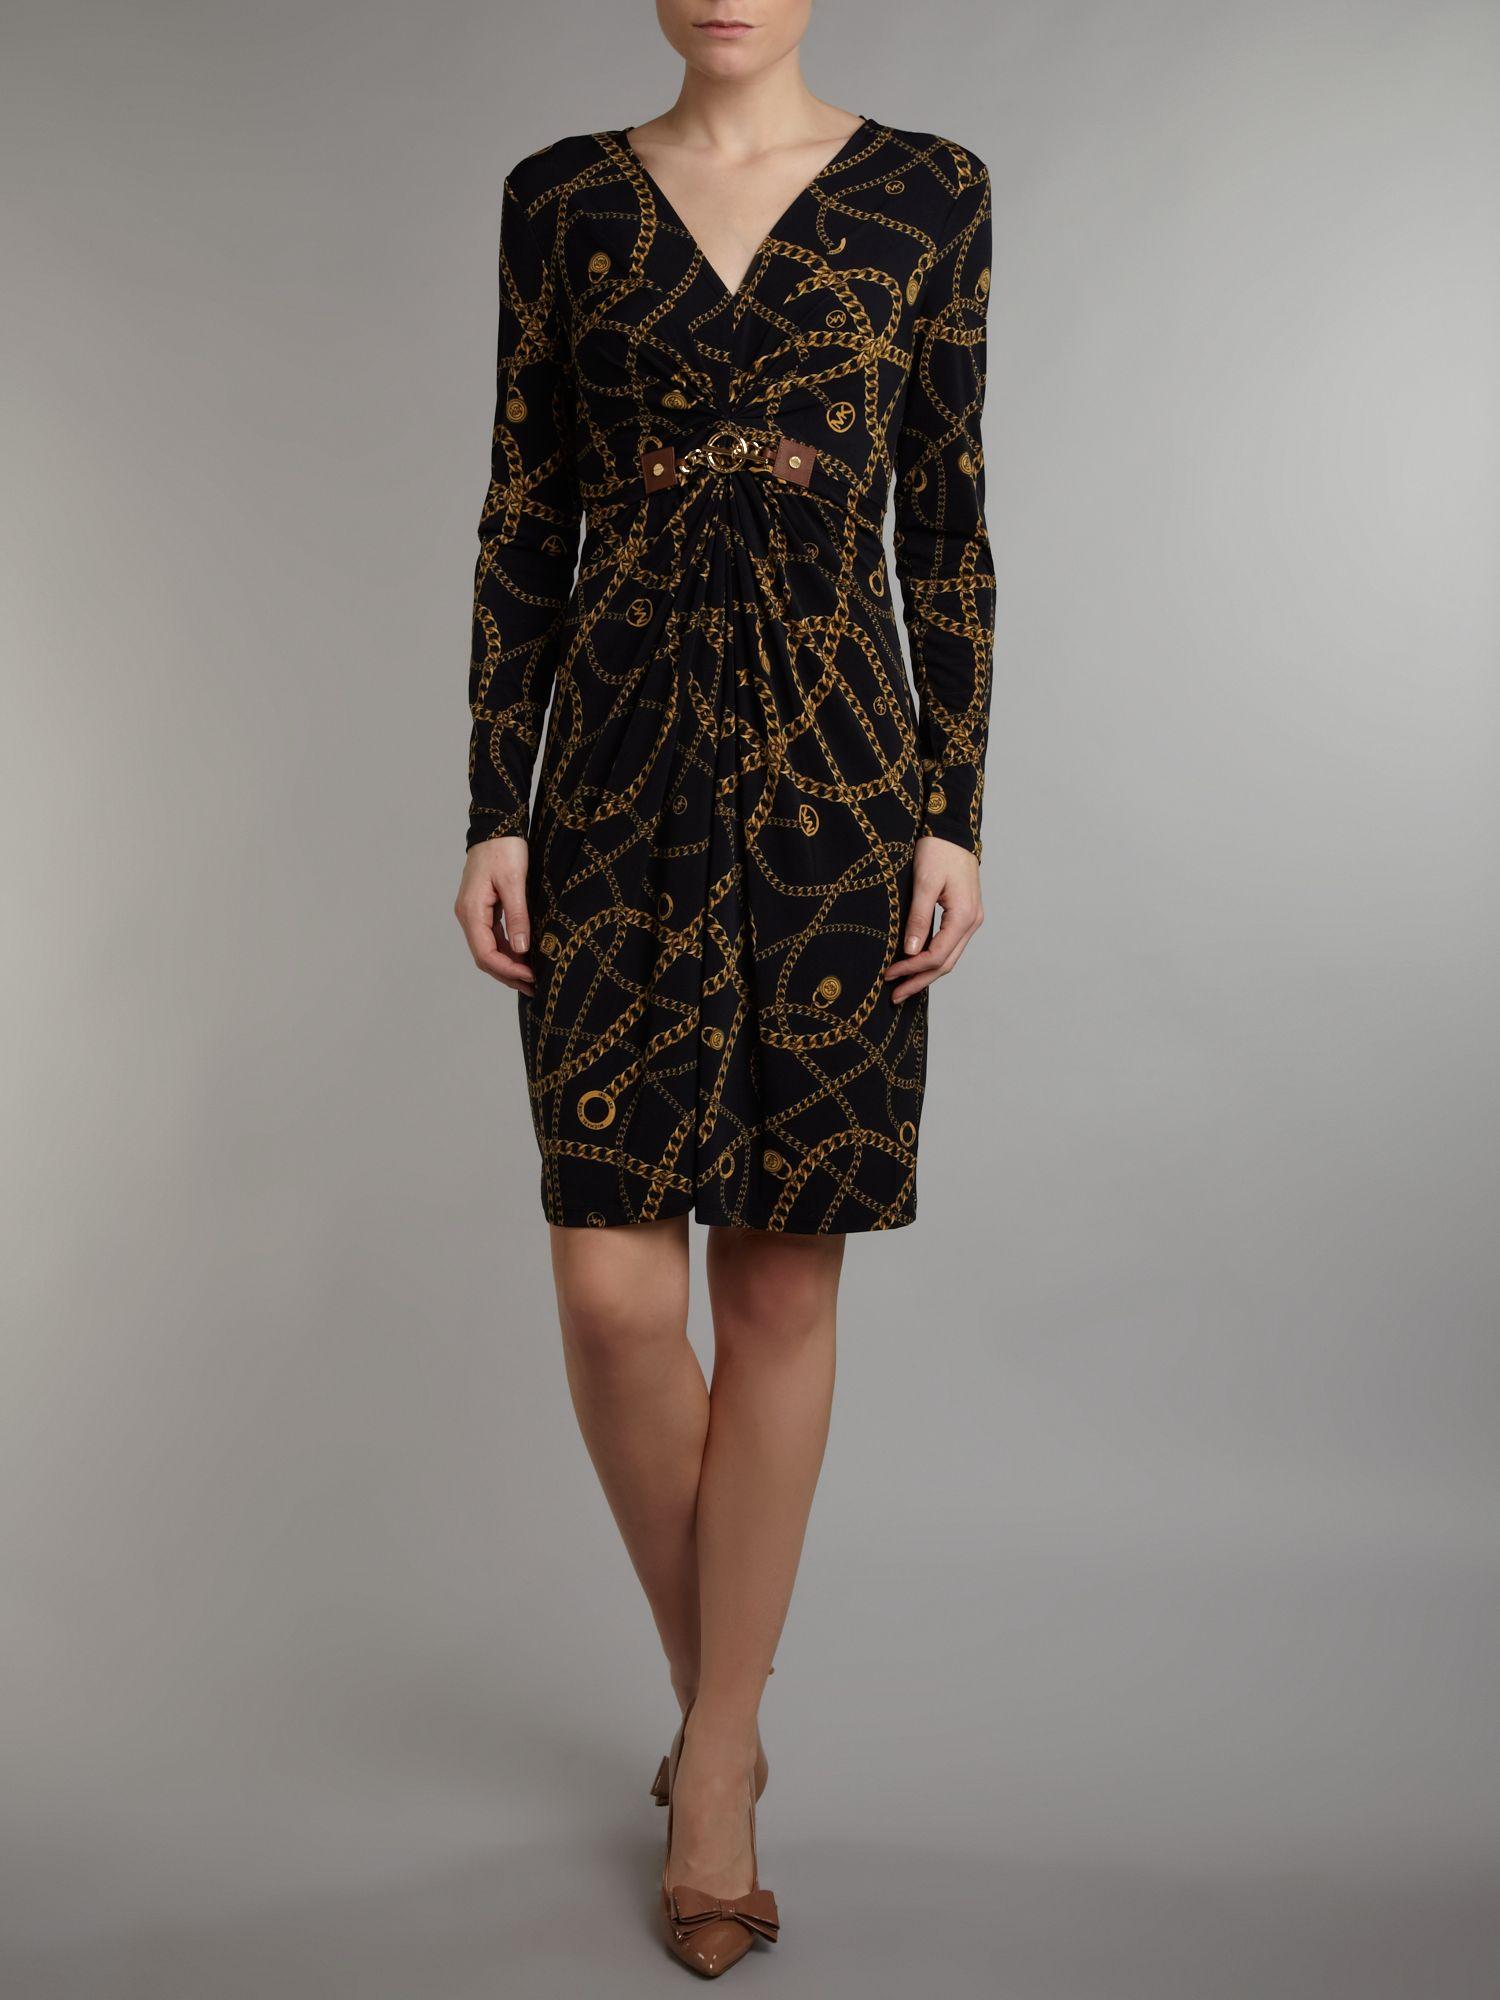 Michael Michael Kors Long Sleeved Chain Print Dress In